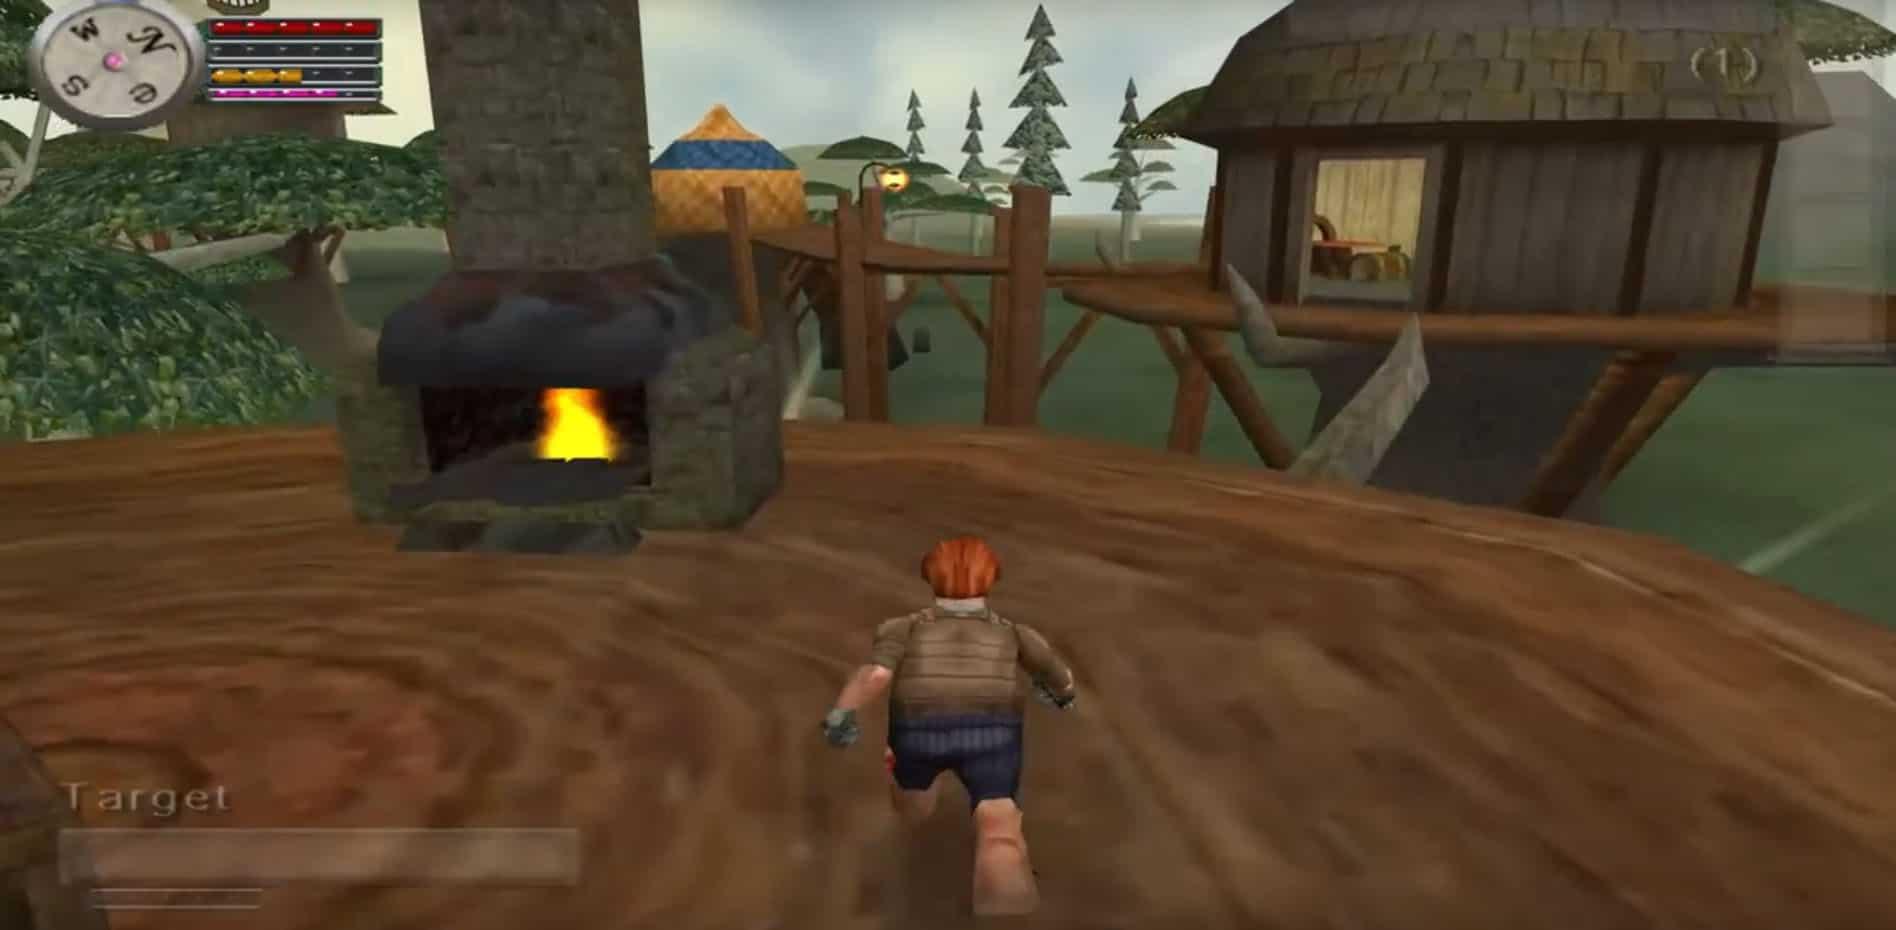 Everquest Online Adventures Private Server Footage 5